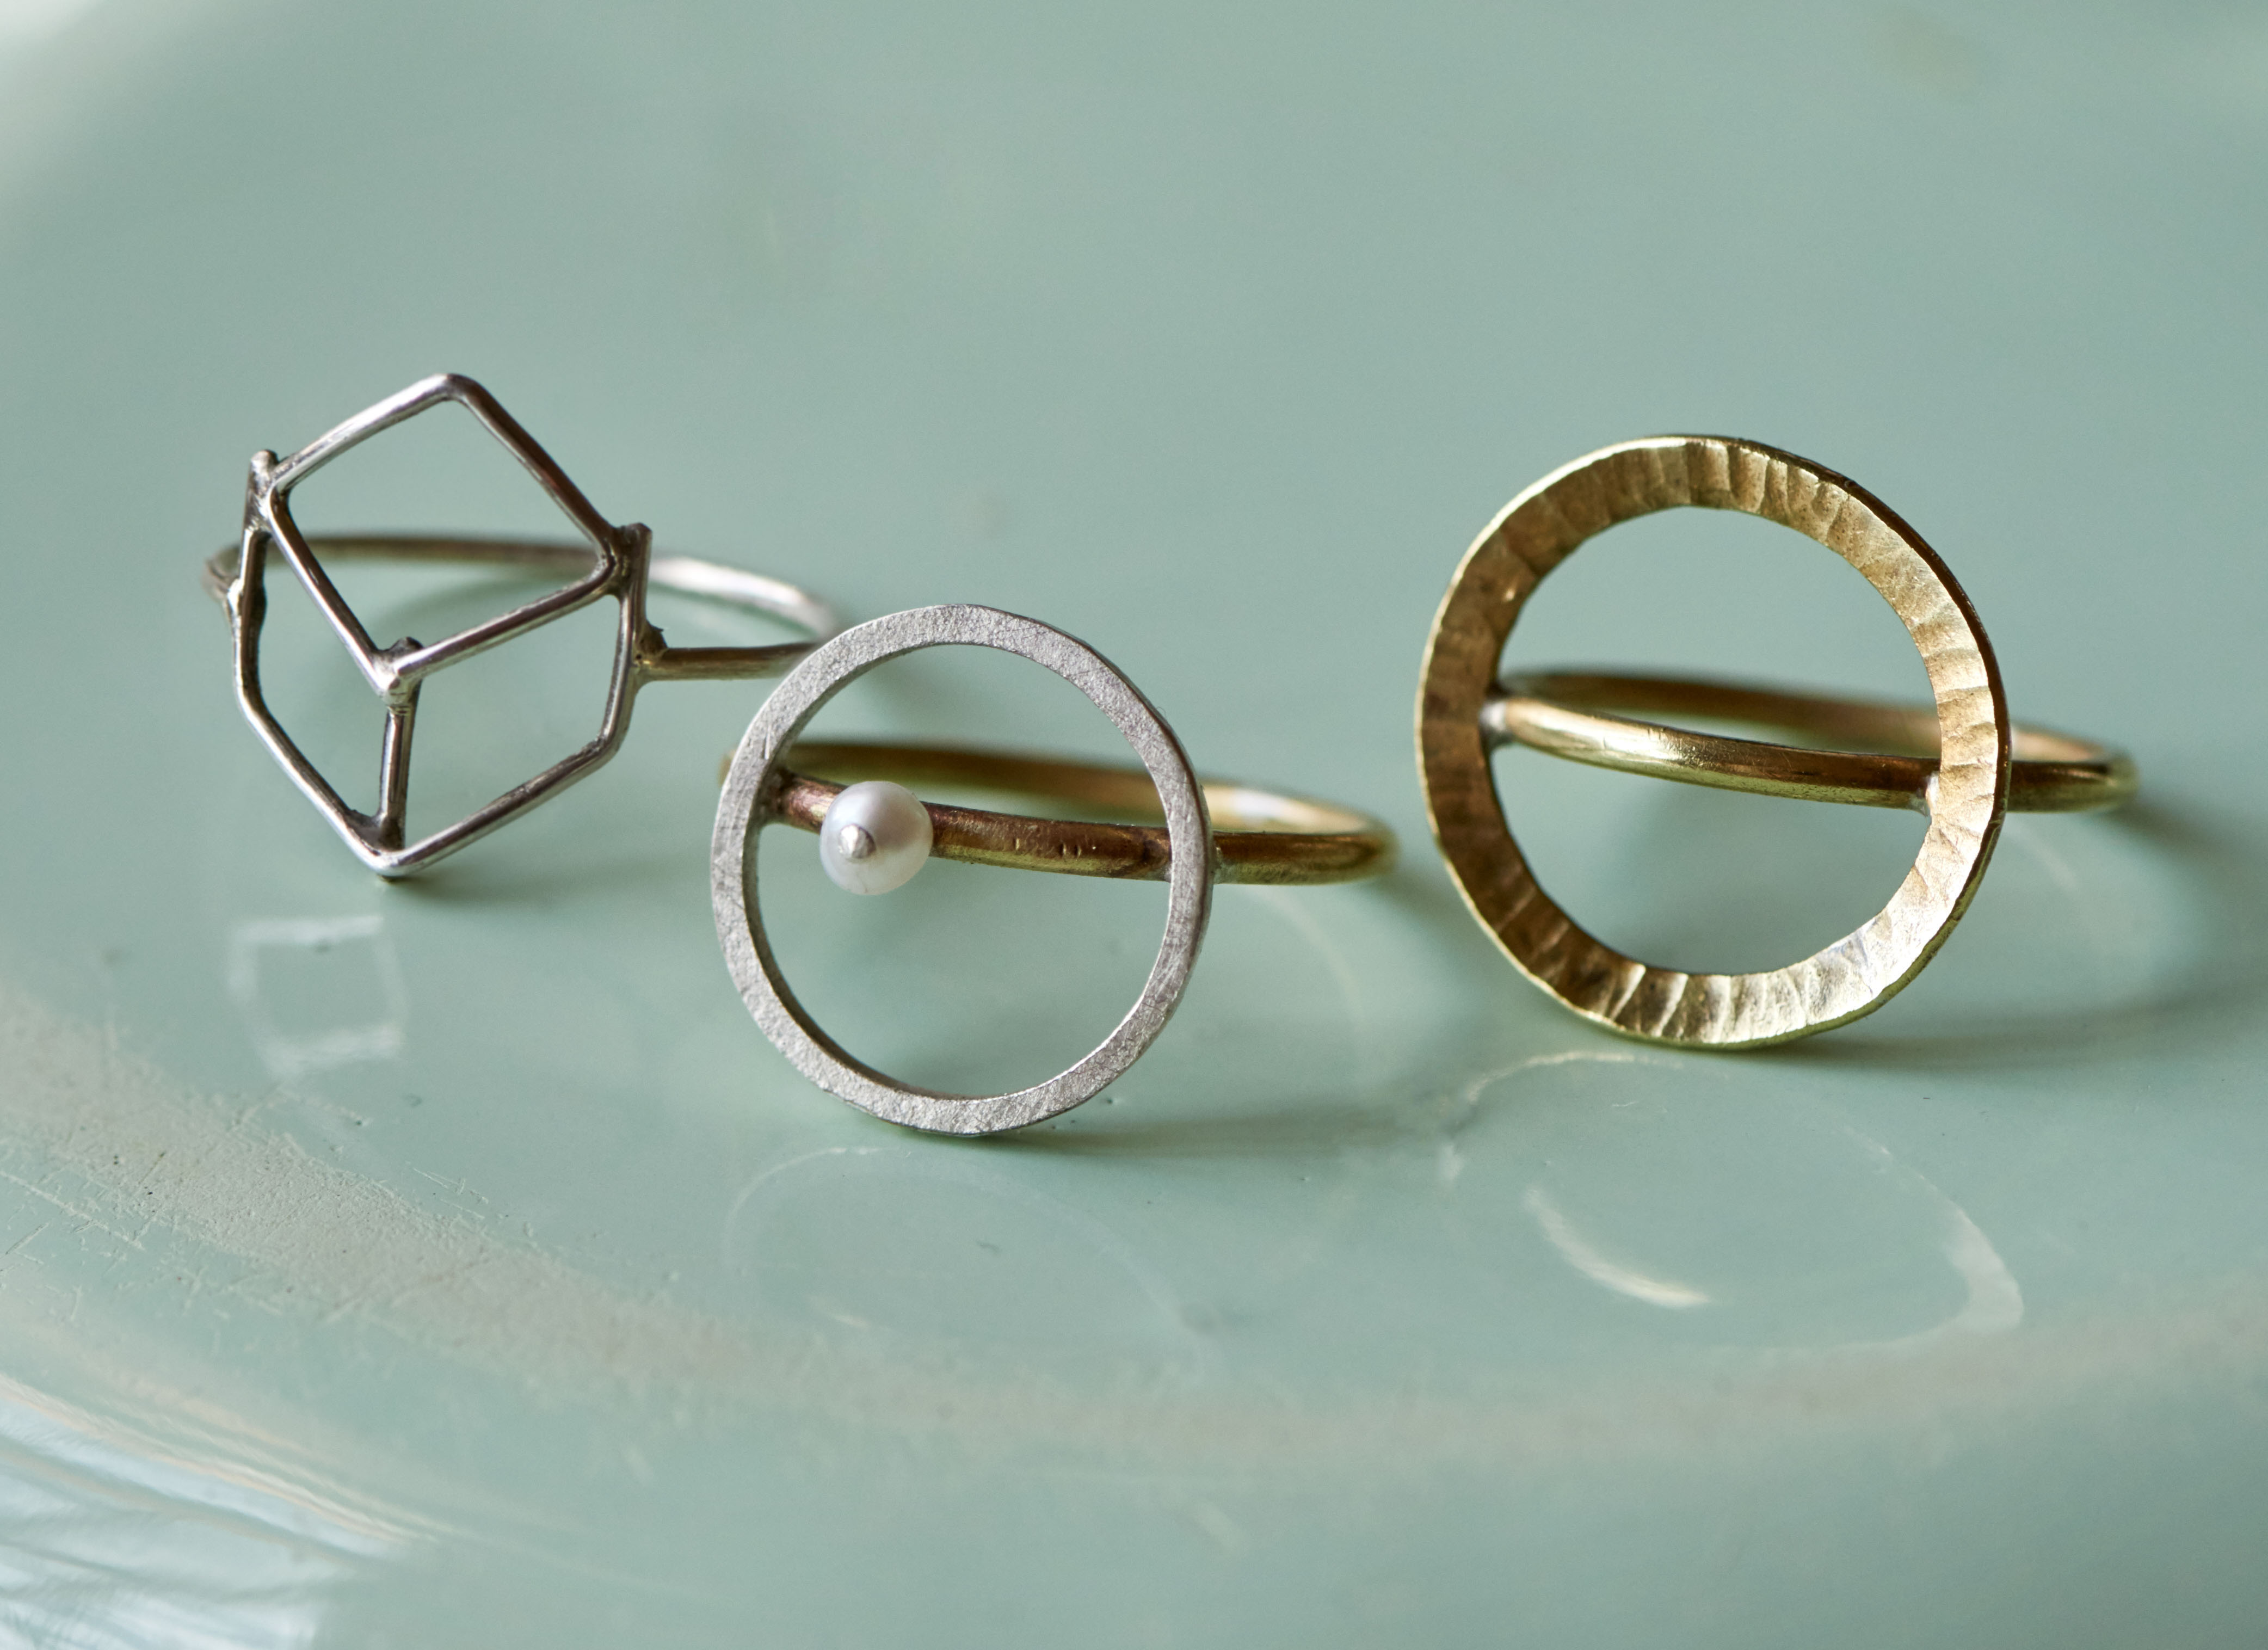 3 rings - Cube, Lunar, Solar